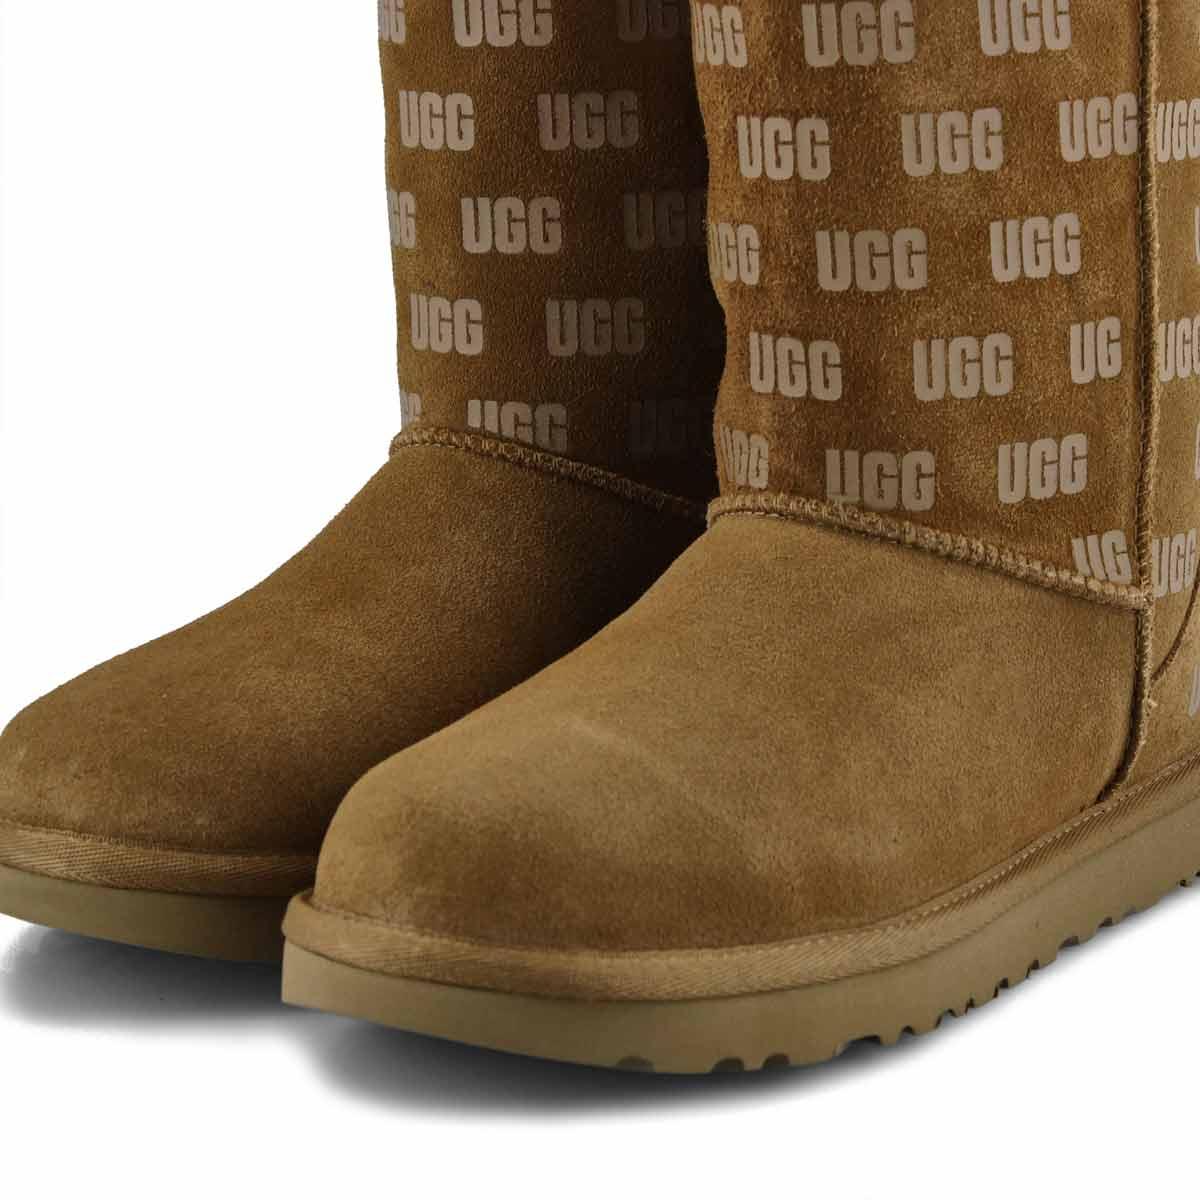 Women's Classic Short II UGG Print Boot - Chestnut